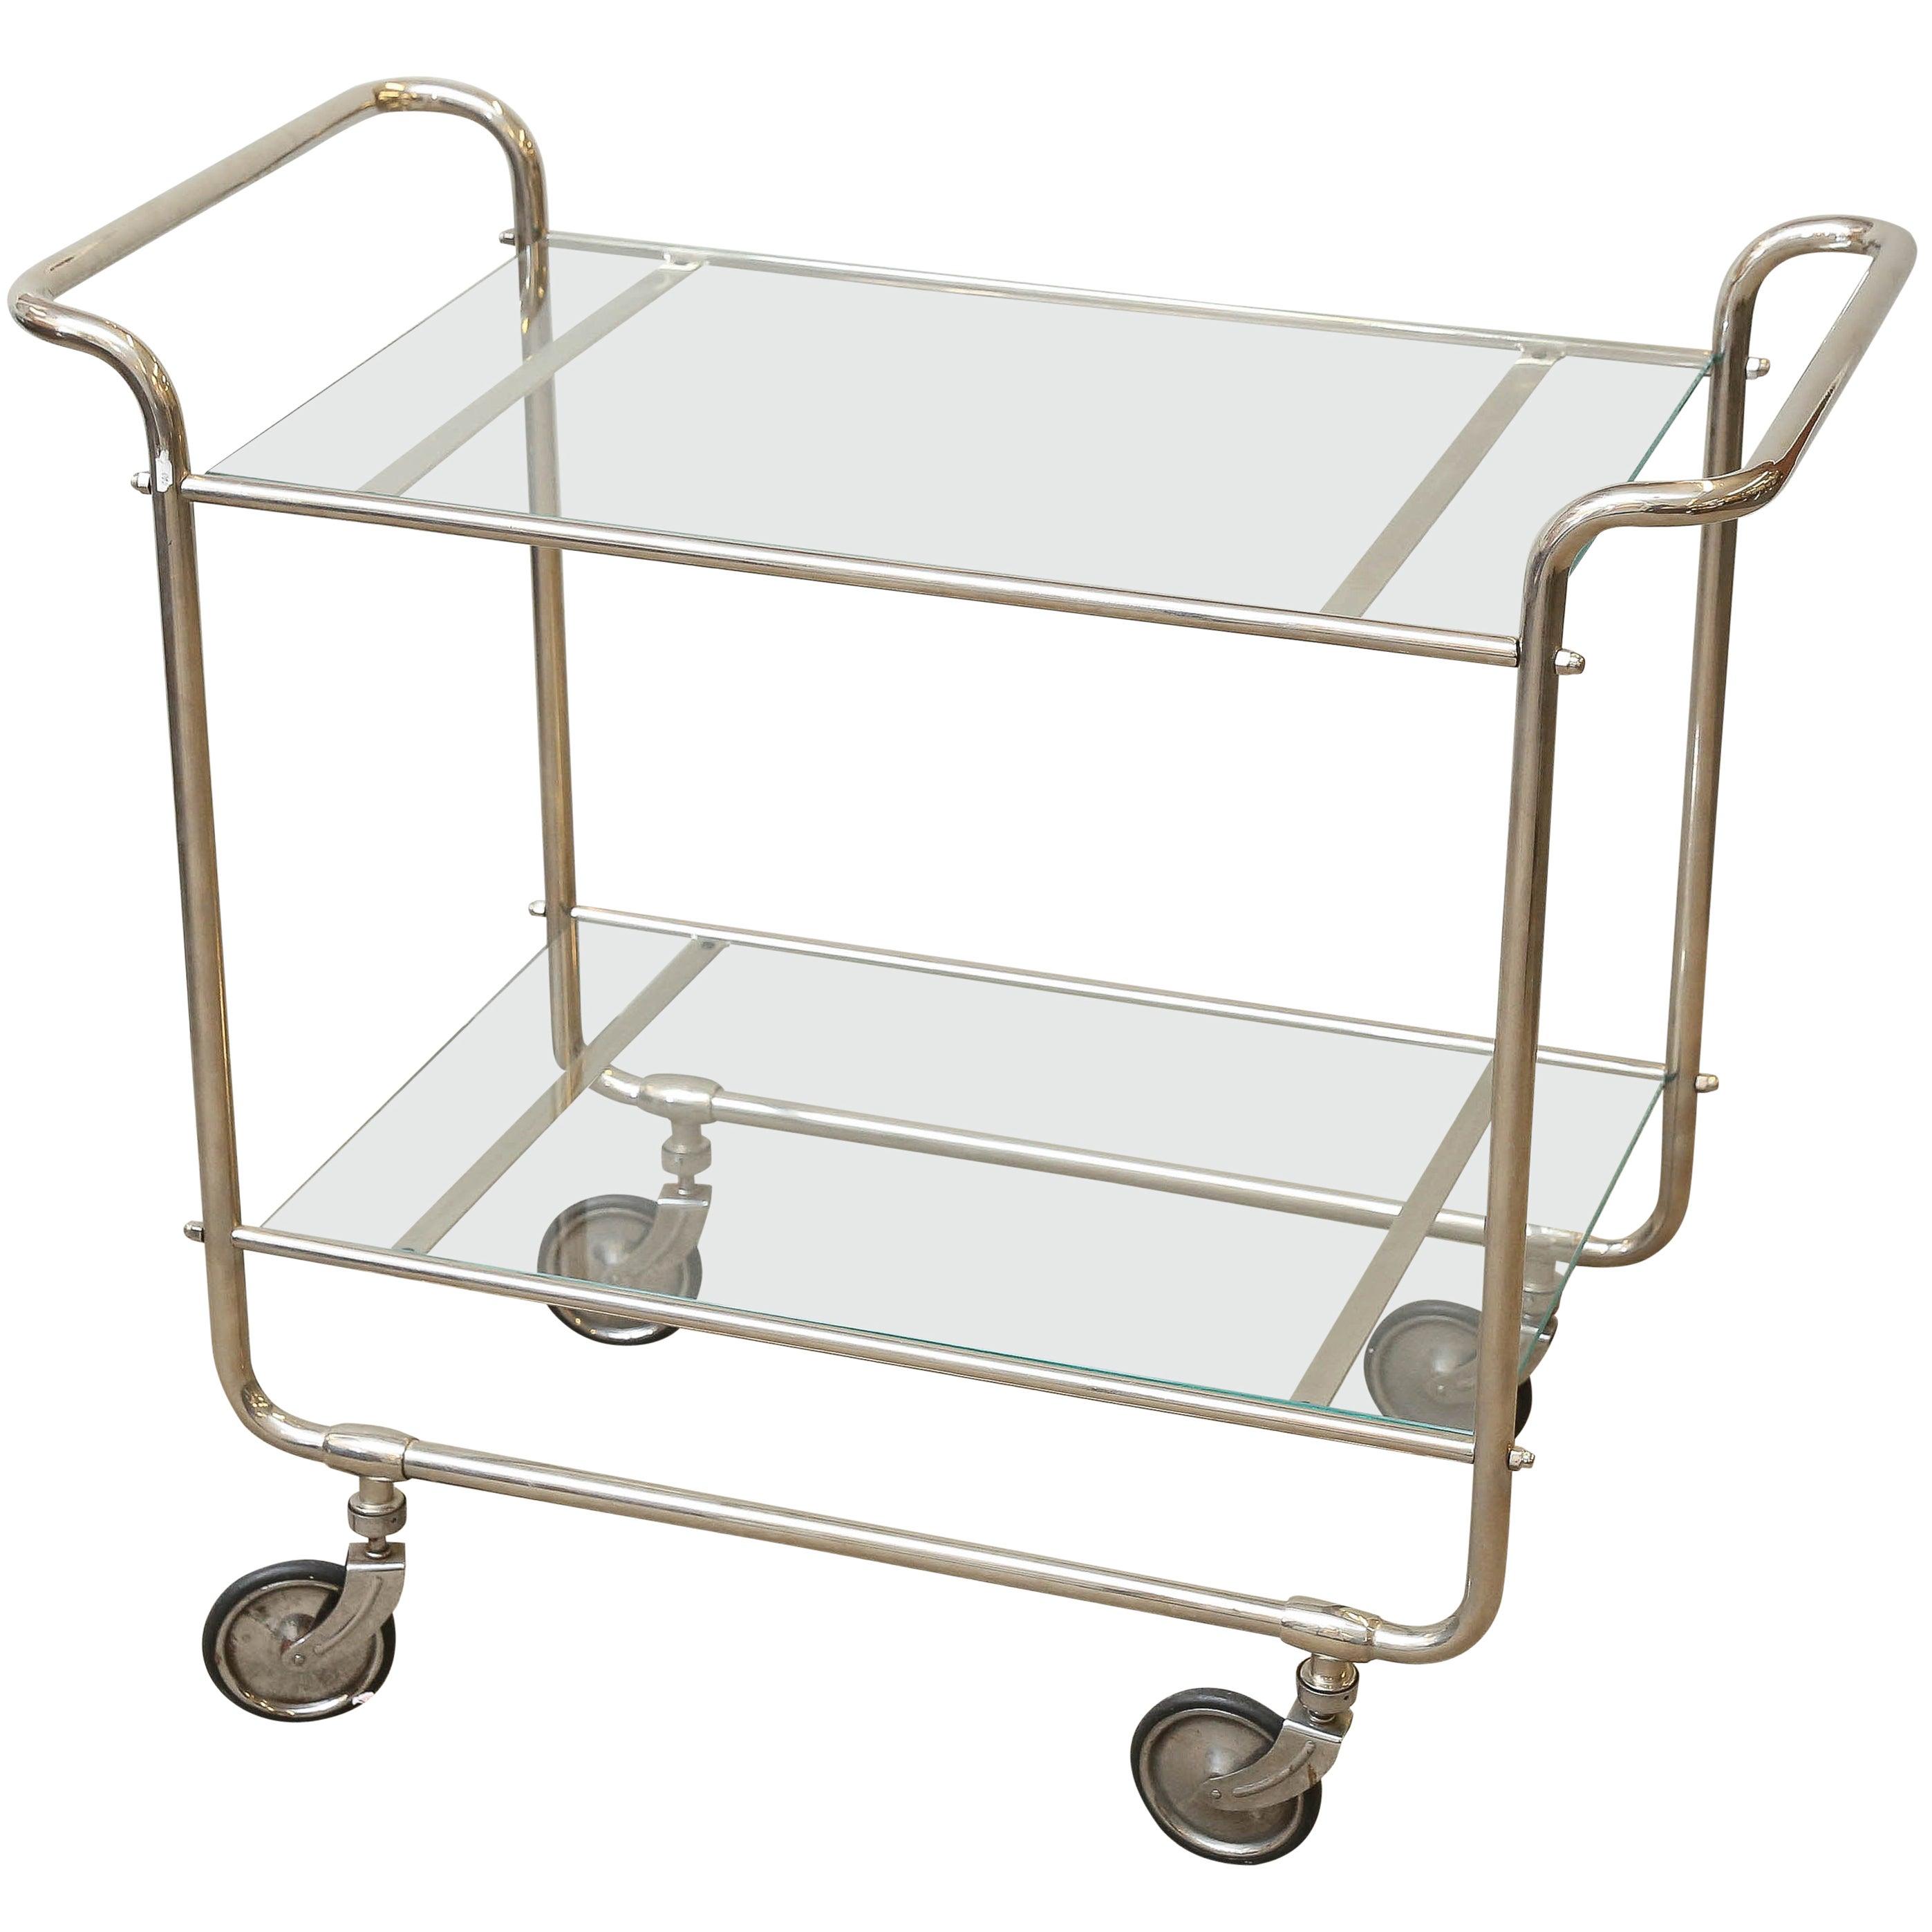 Hungarian Art Deco Glass and Chrome Bar Cart